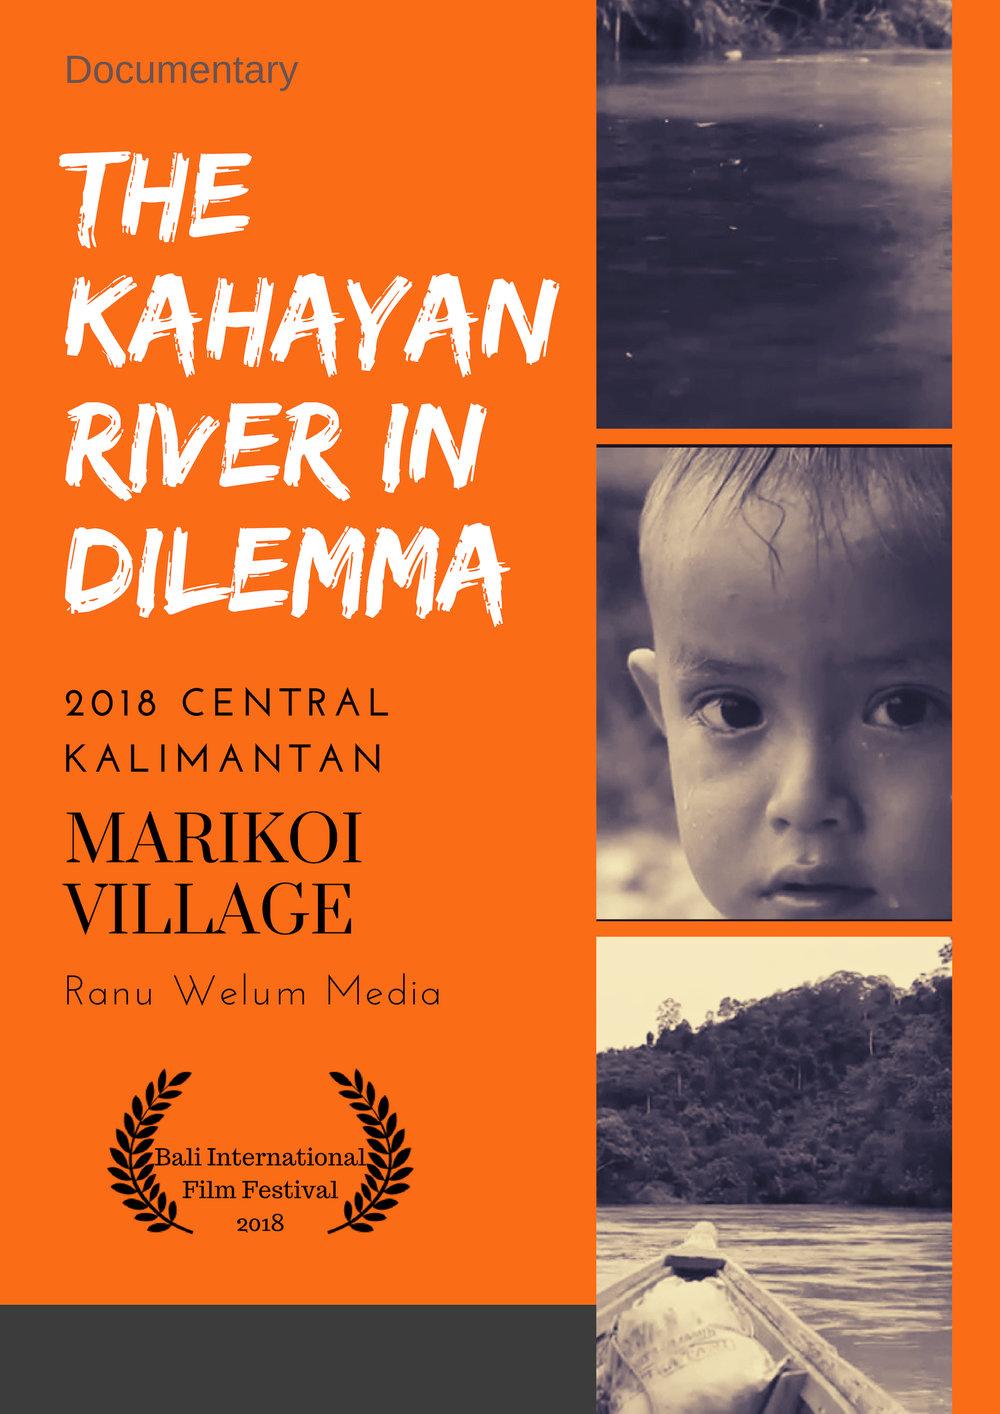 The kahayan river in dilemma.jpg